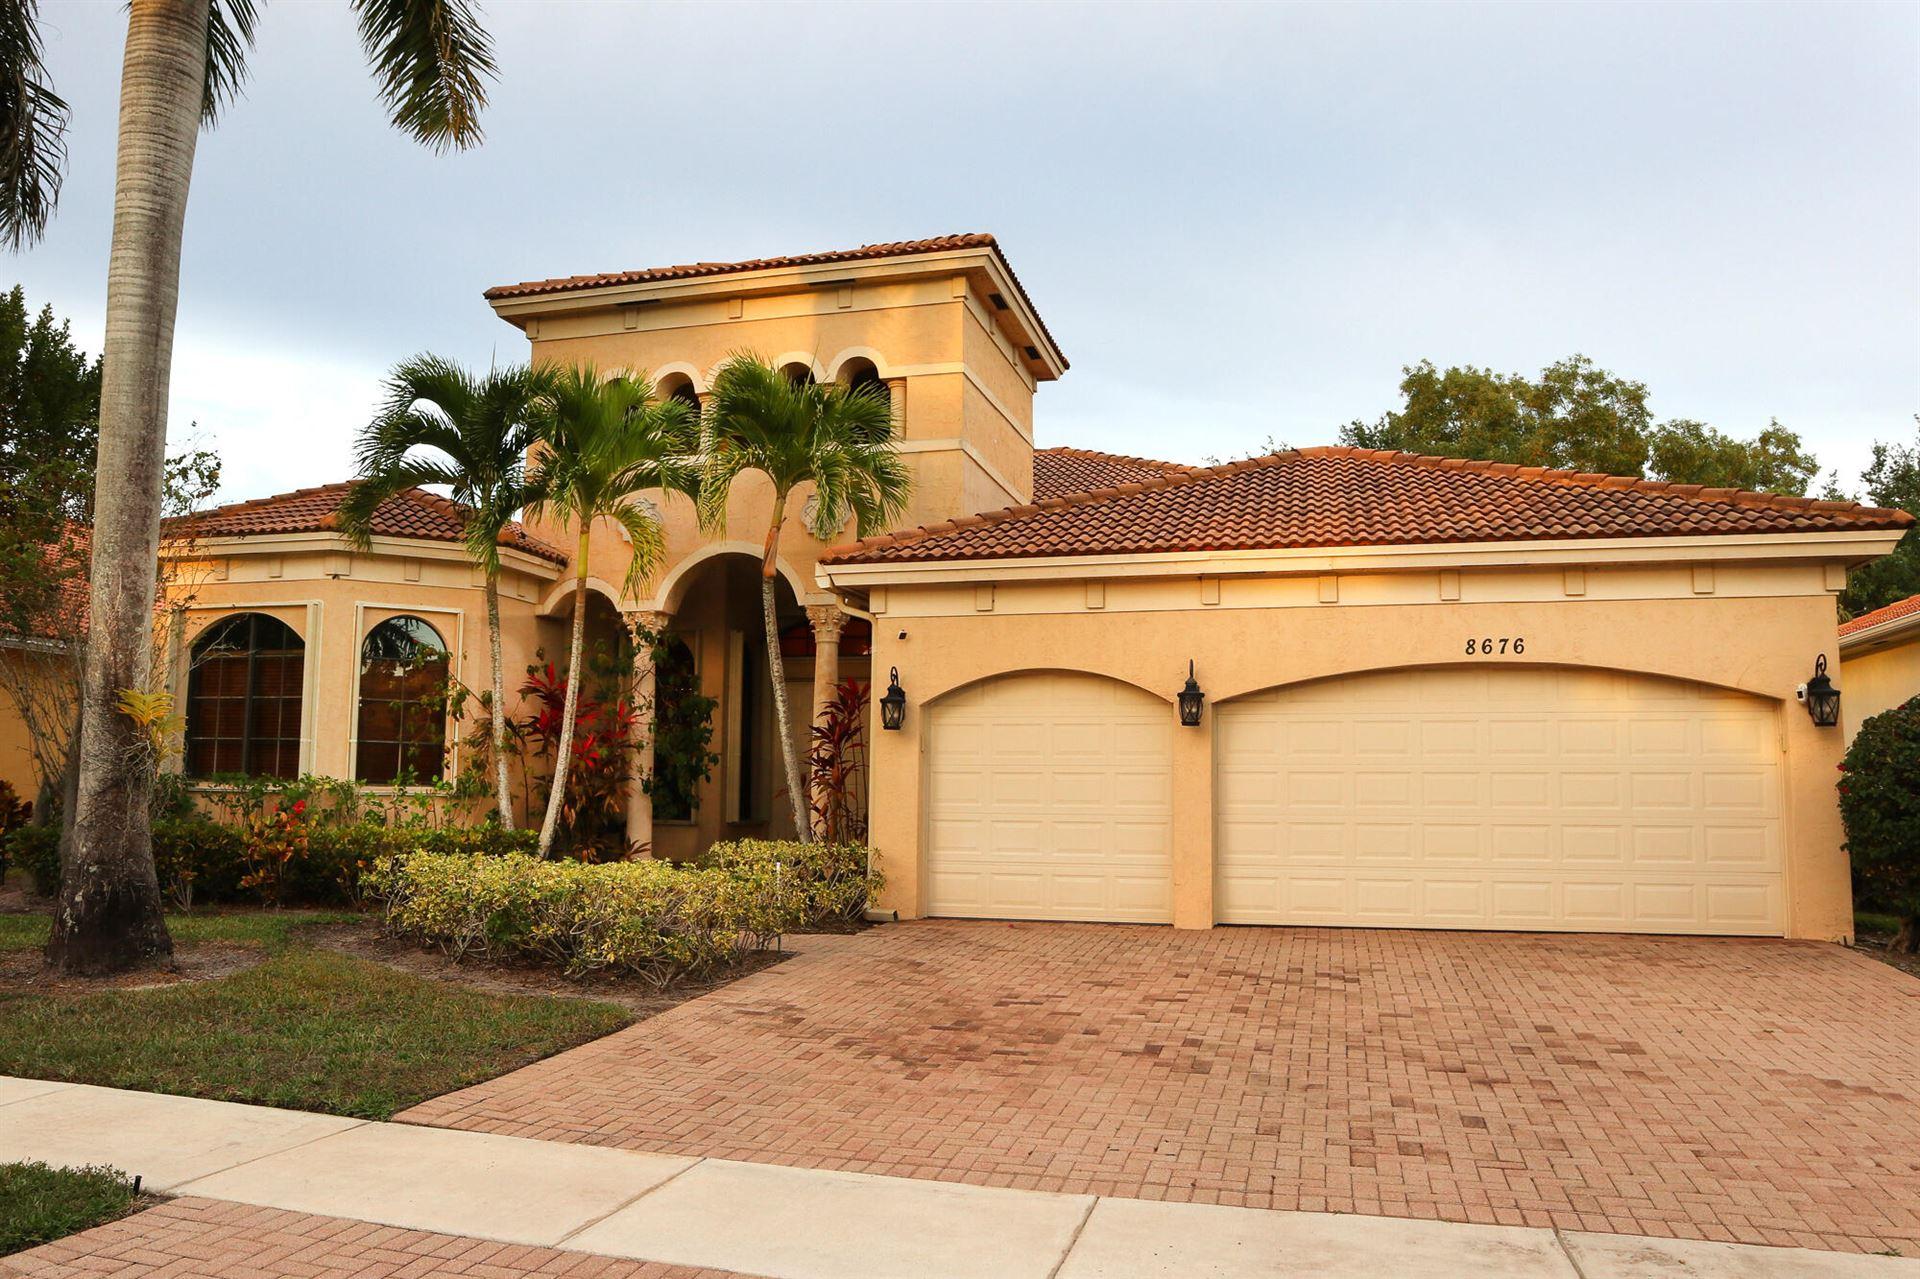 8676 Club Estates Way, Lake Worth, FL 33467 - #: RX-10704857